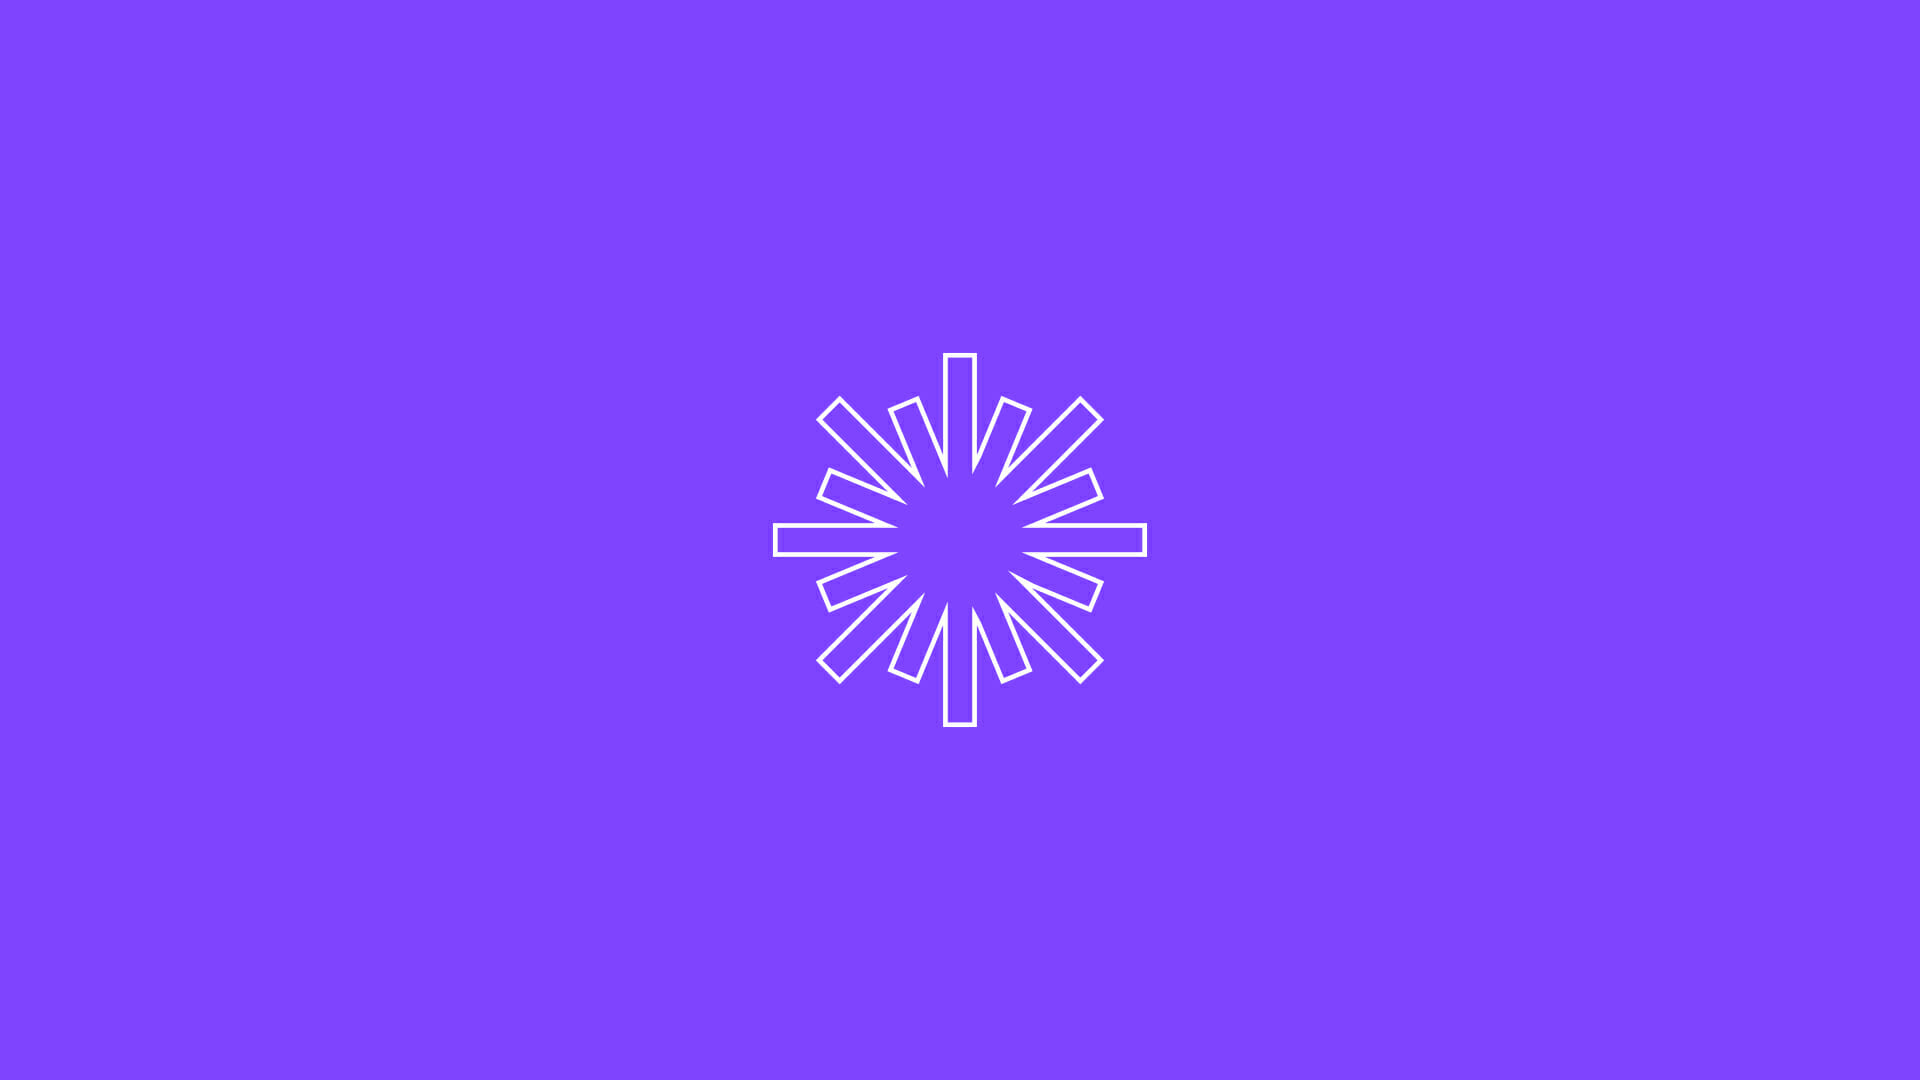 spate-icon